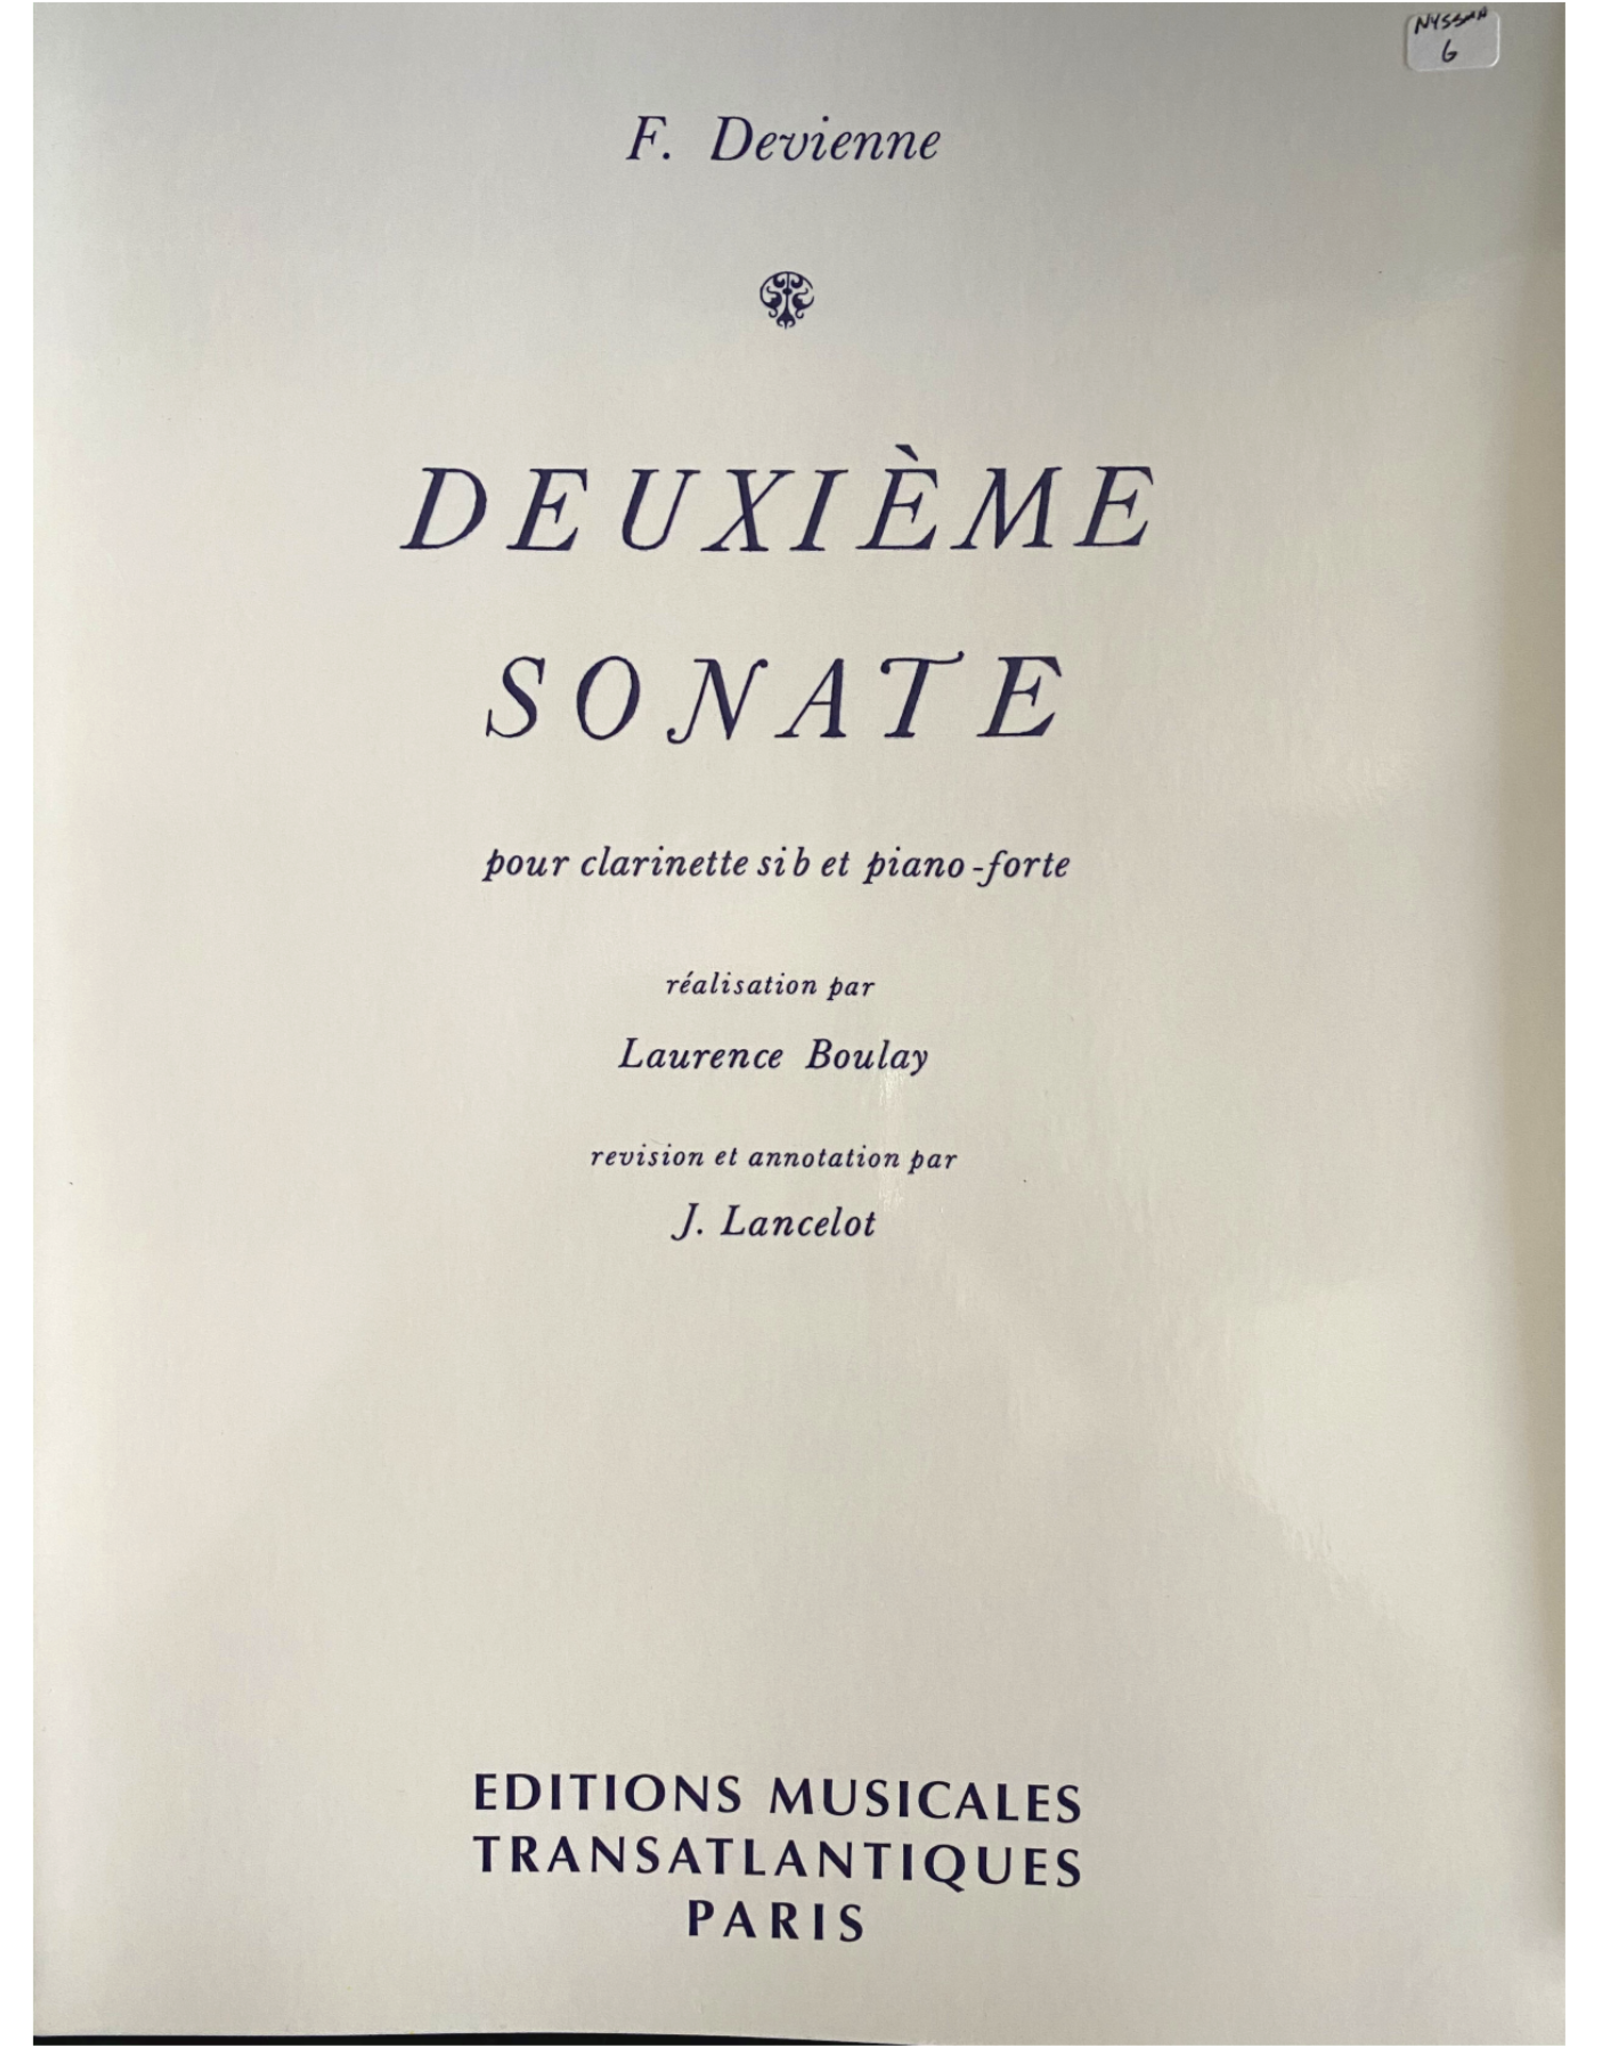 Hal Leonard Devienne Sonata No. 2 for Clarinet and Piano